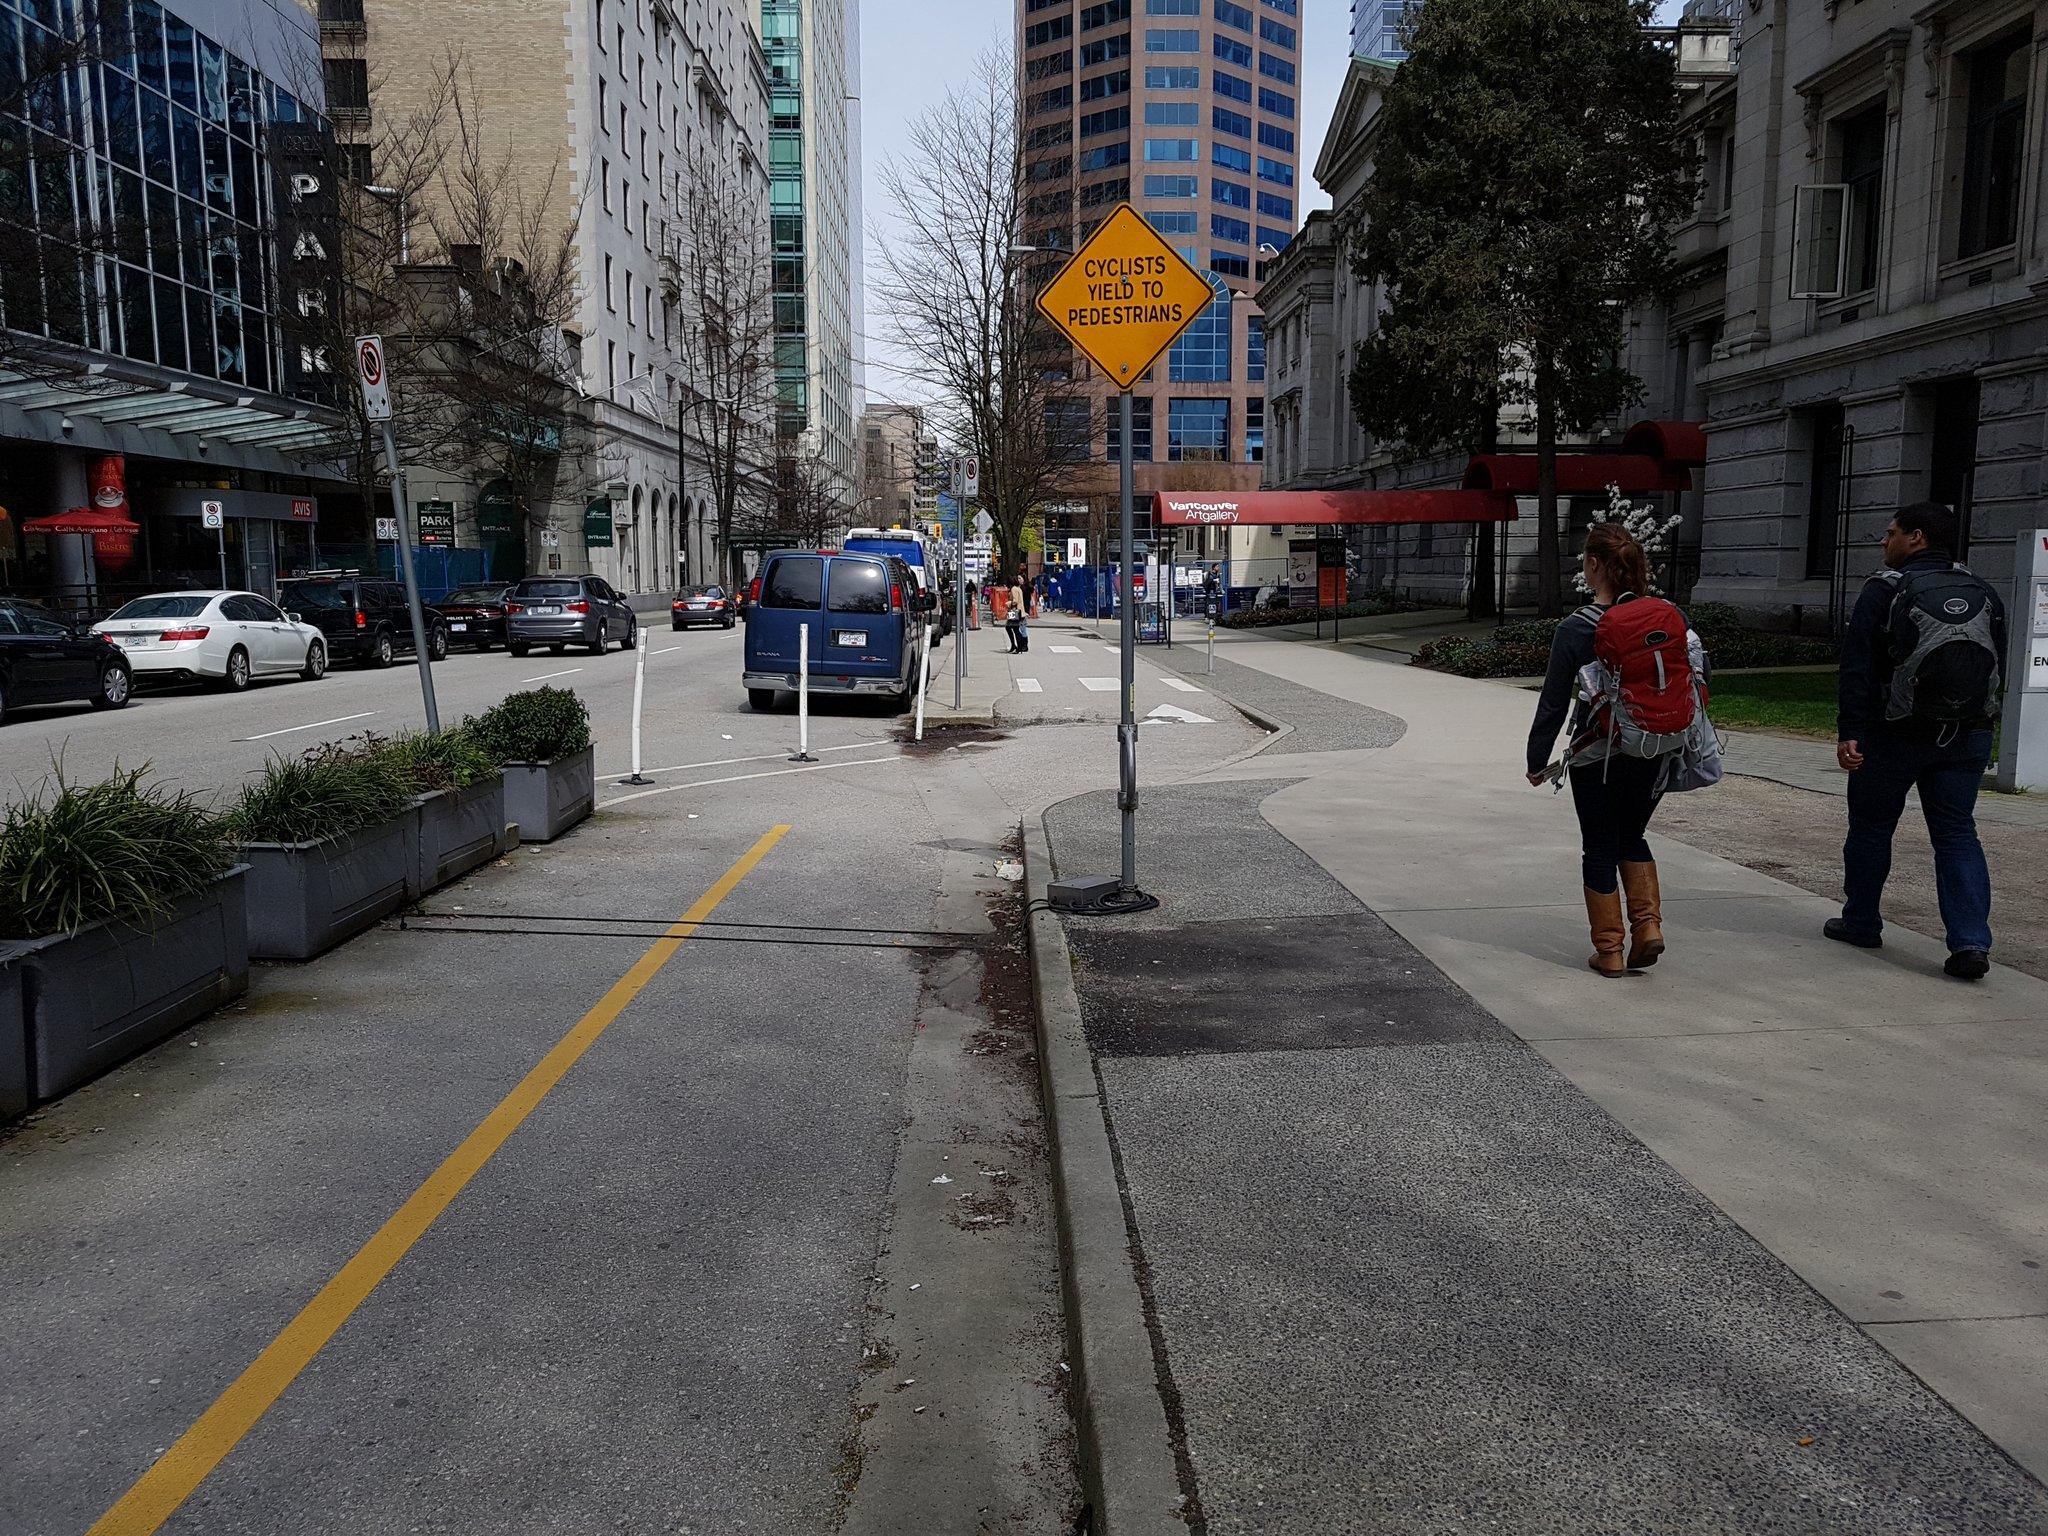 .@Musettecaffe Short section of raised bike lane provides loading zone for Art Gallery #yyjbike https://t.co/UFyQ3cGHTx